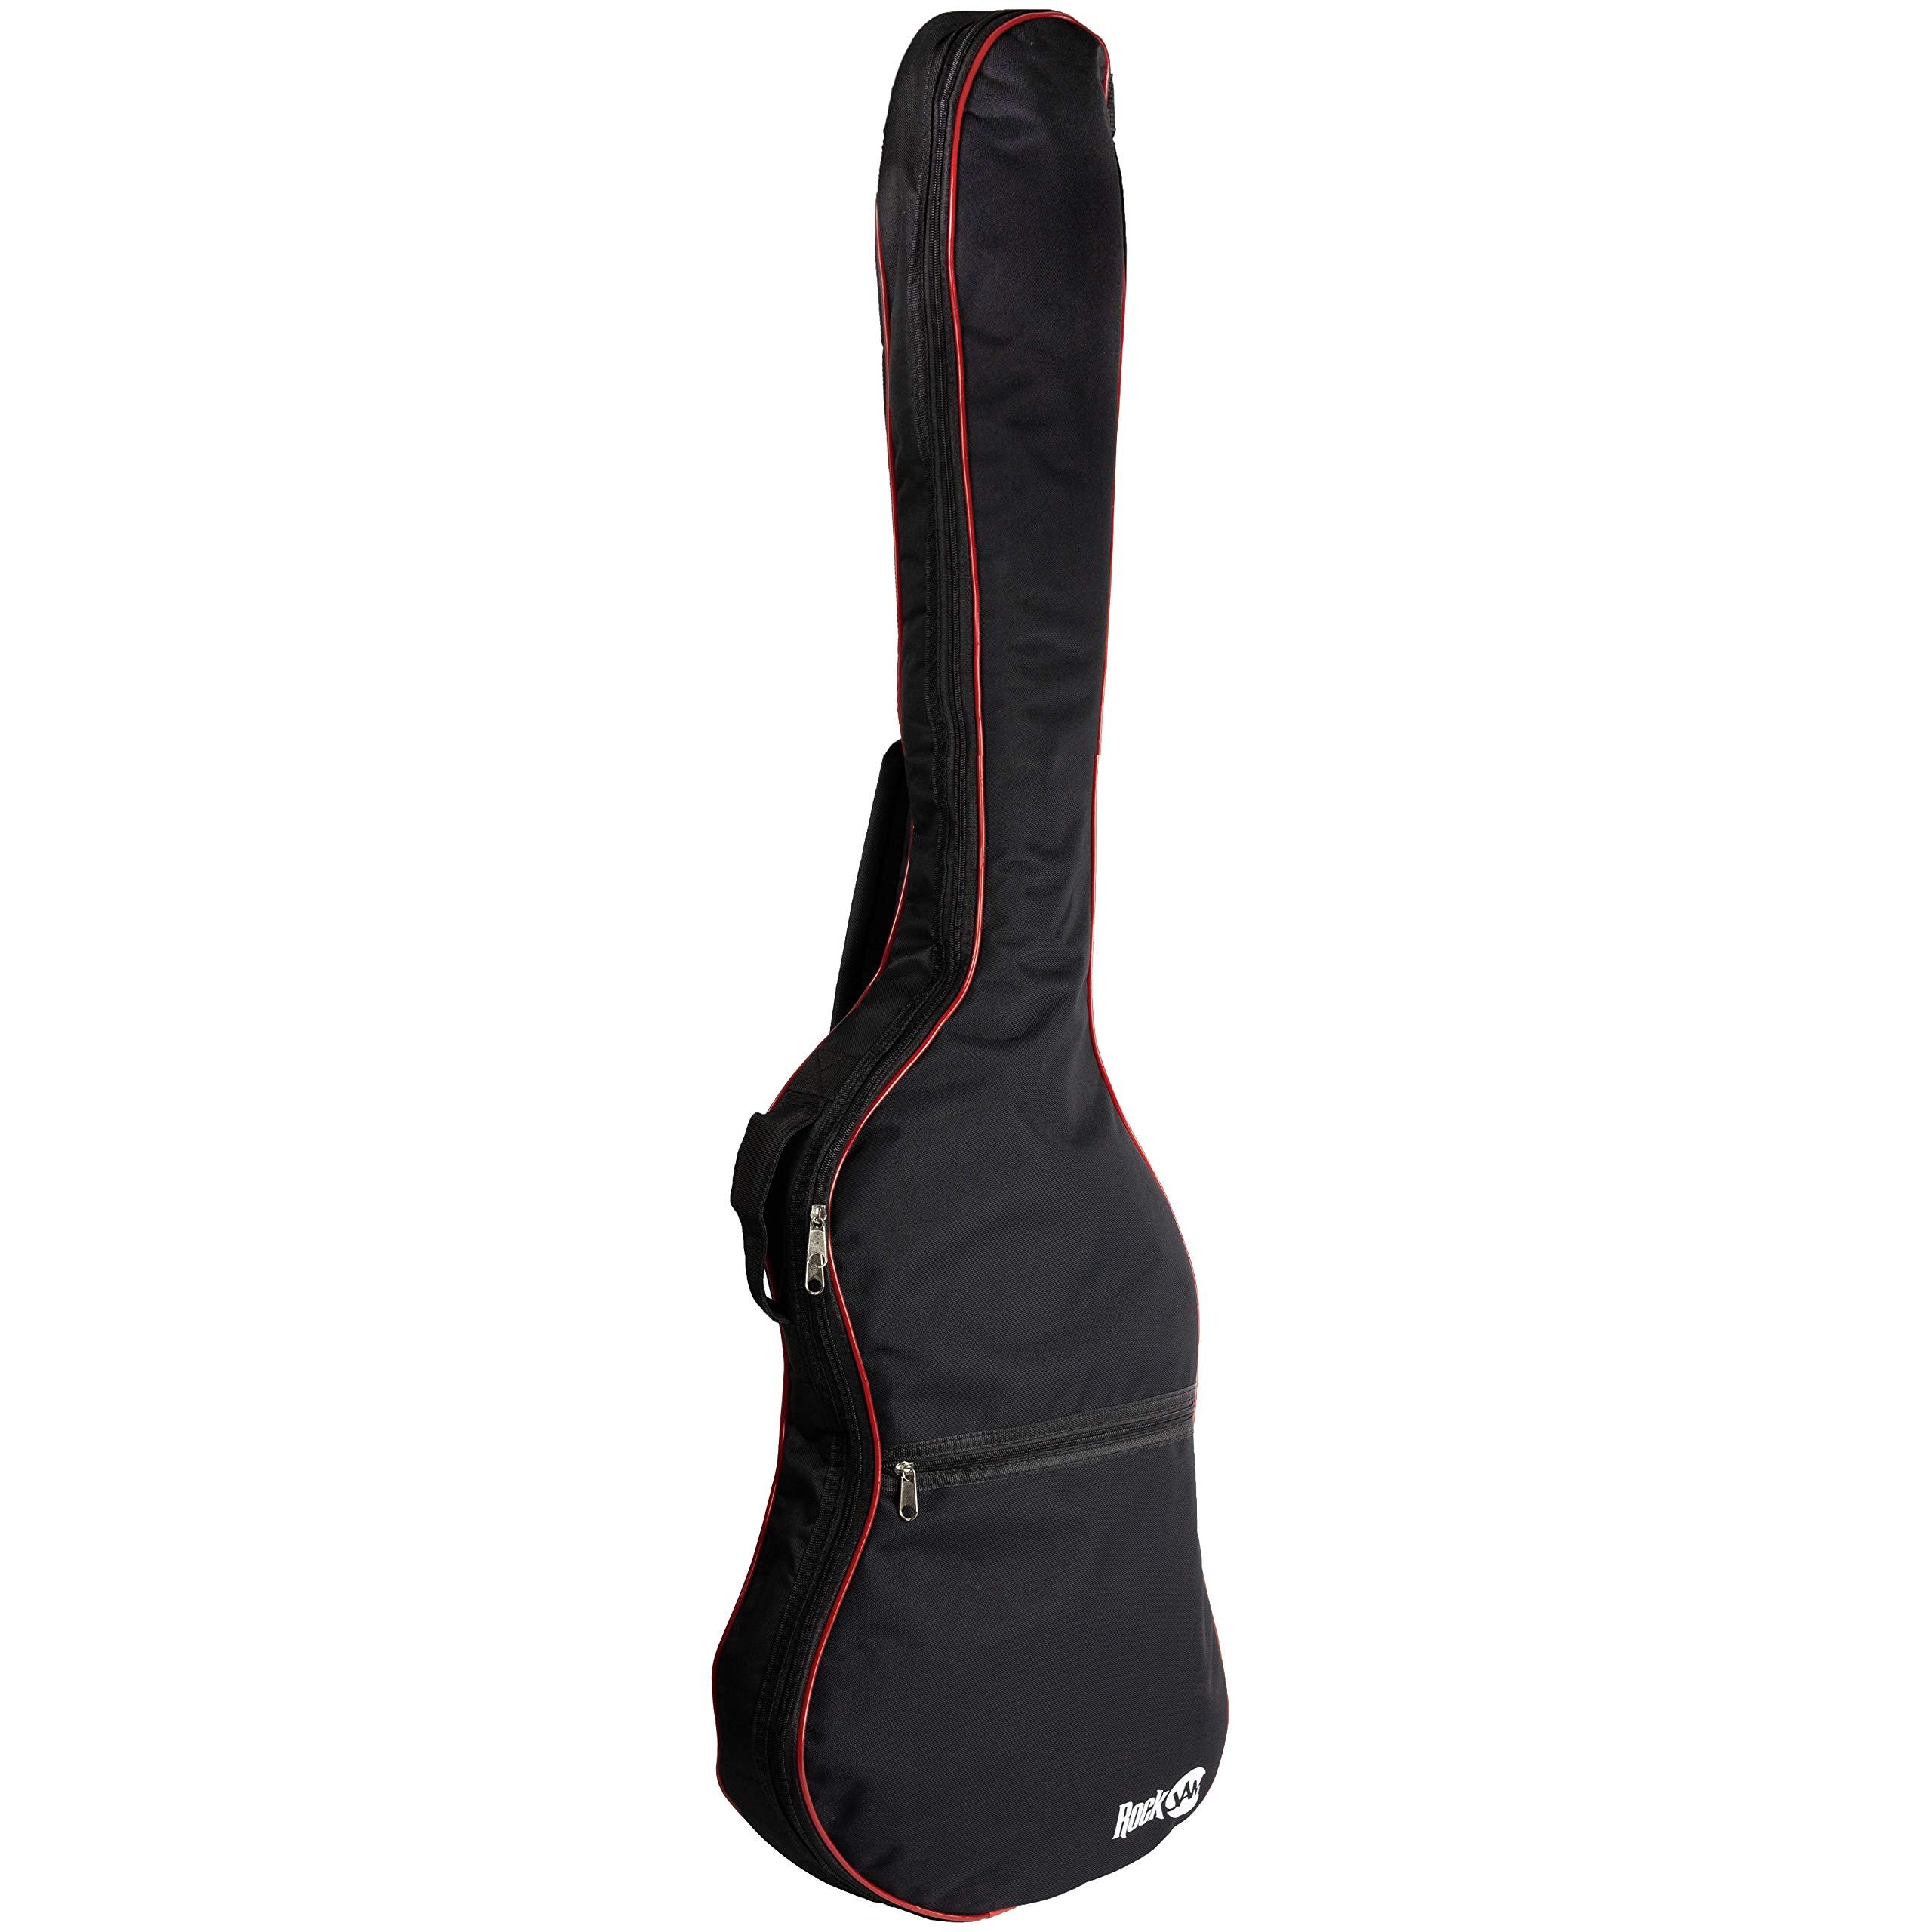 RockJam BGB-02 - Bass guitar product image